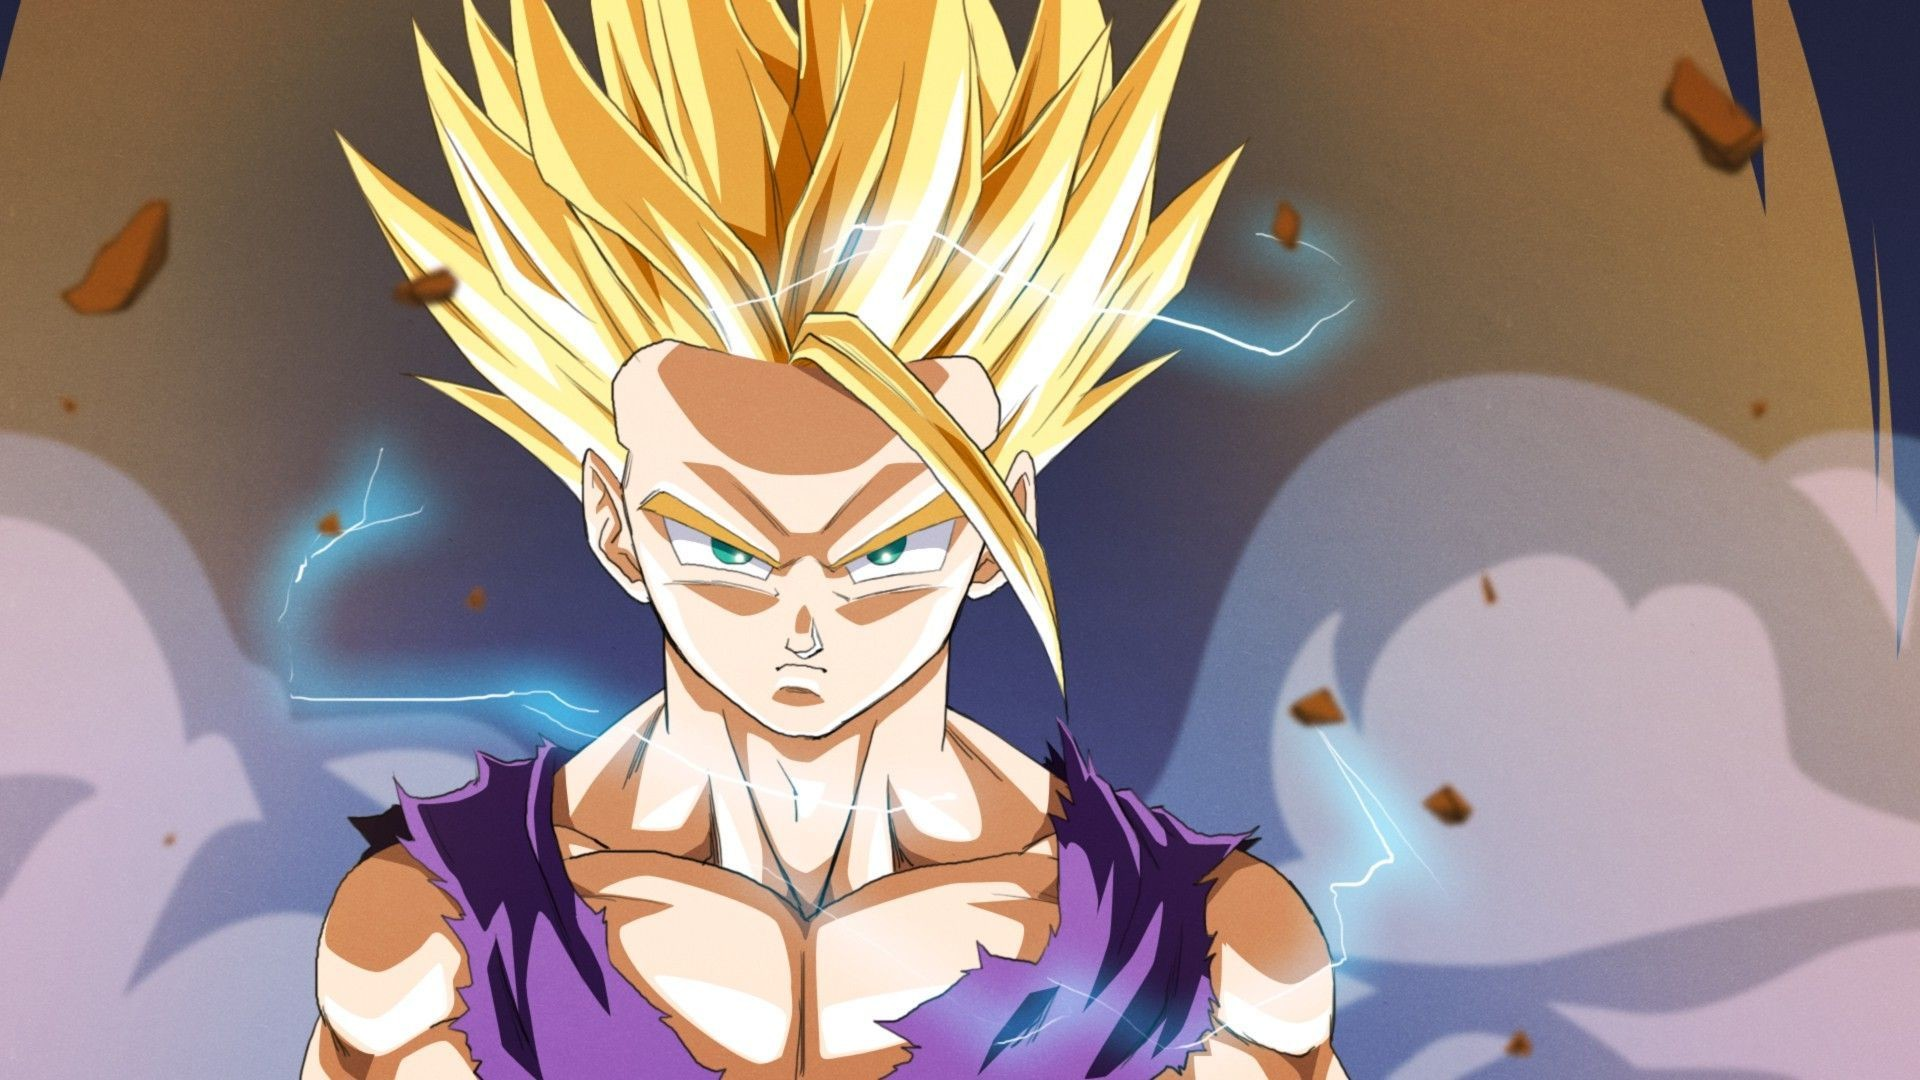 Vegeta Vs Goku Dragon Ball Z wallpaper © 1ms.net